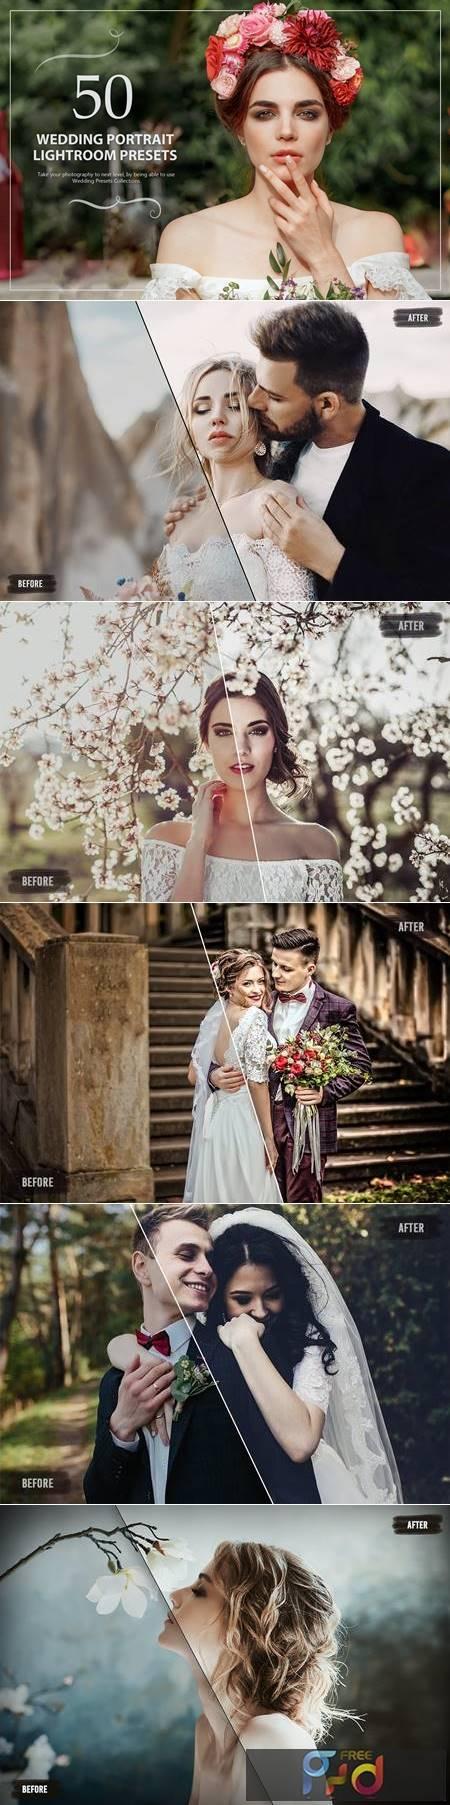 50 Wedding Portrait Lightroom Presets J7DN5W7 1